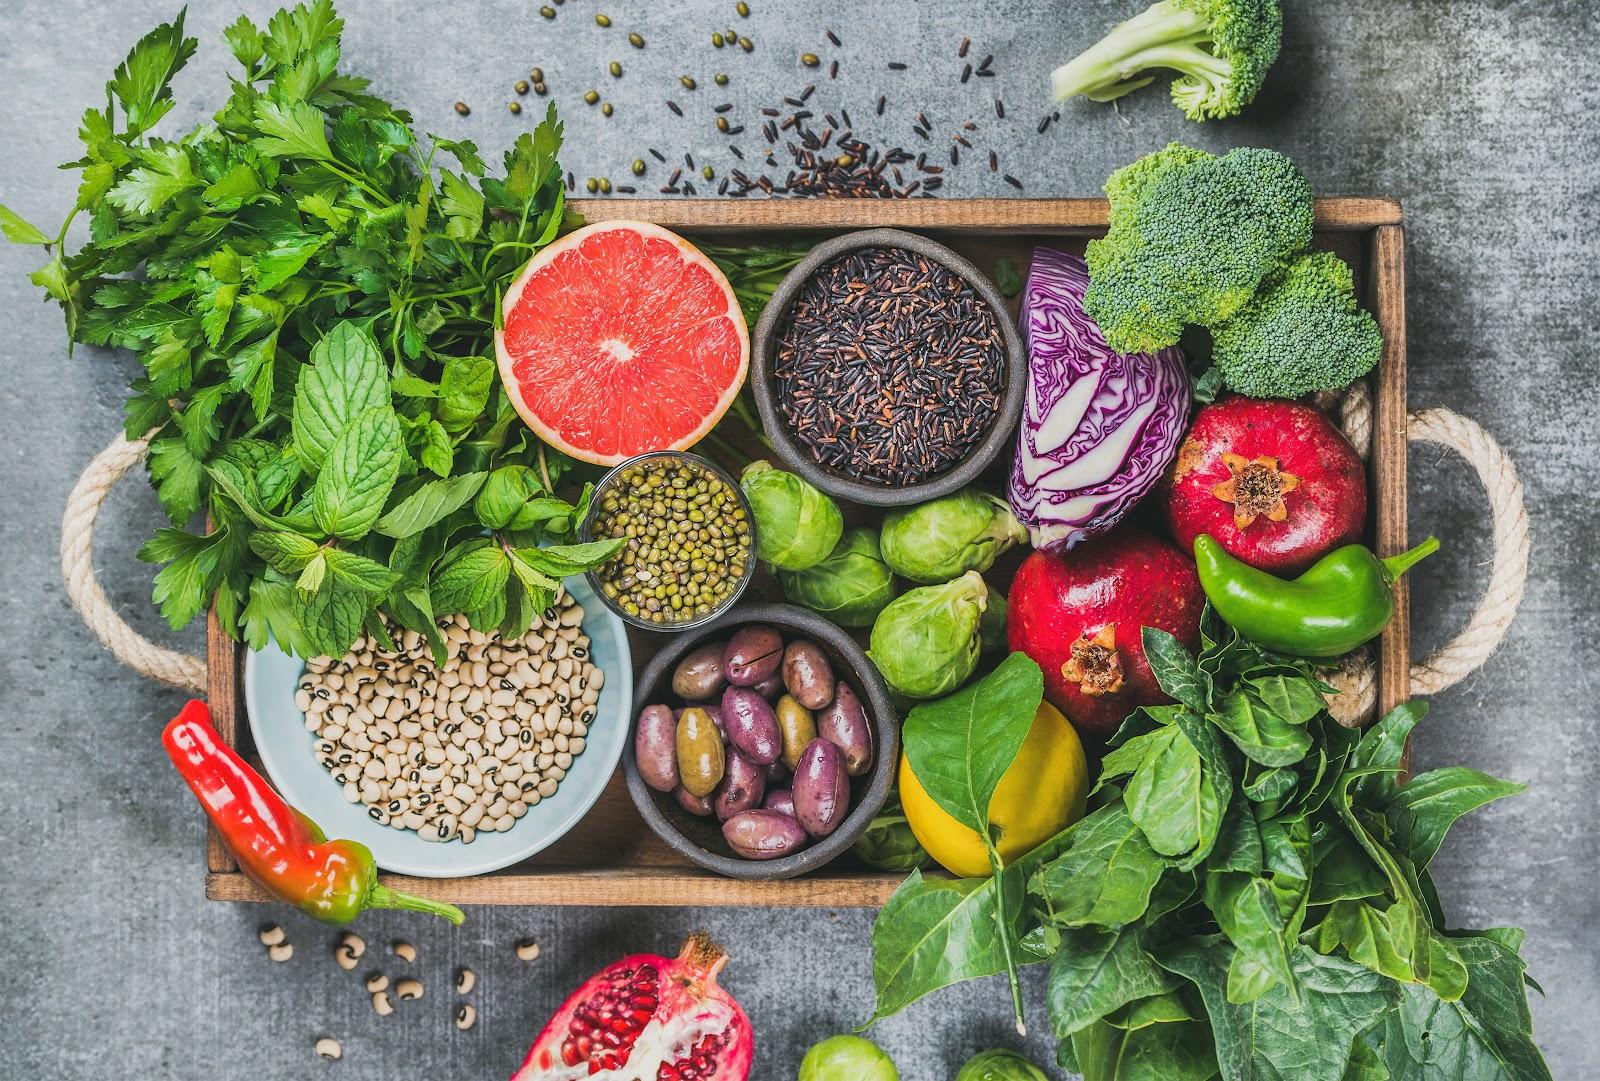 legumes e cereais